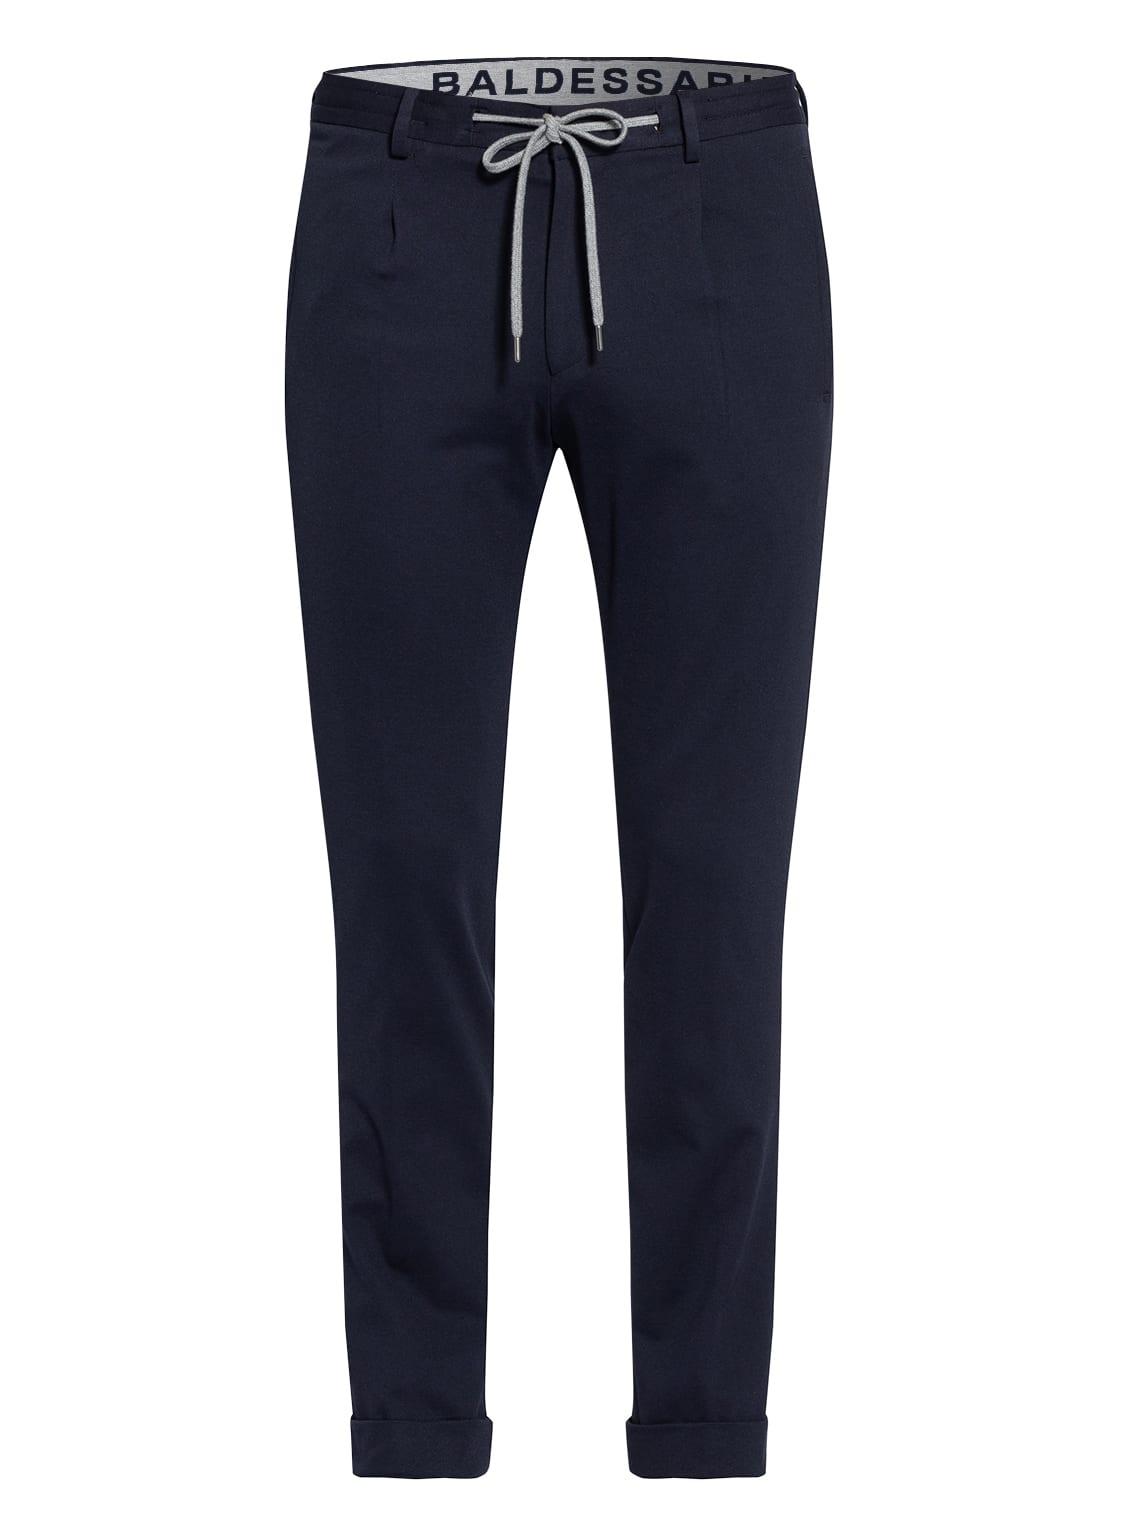 Image of Baldessarini Anzughose Cross Slim Fit blau